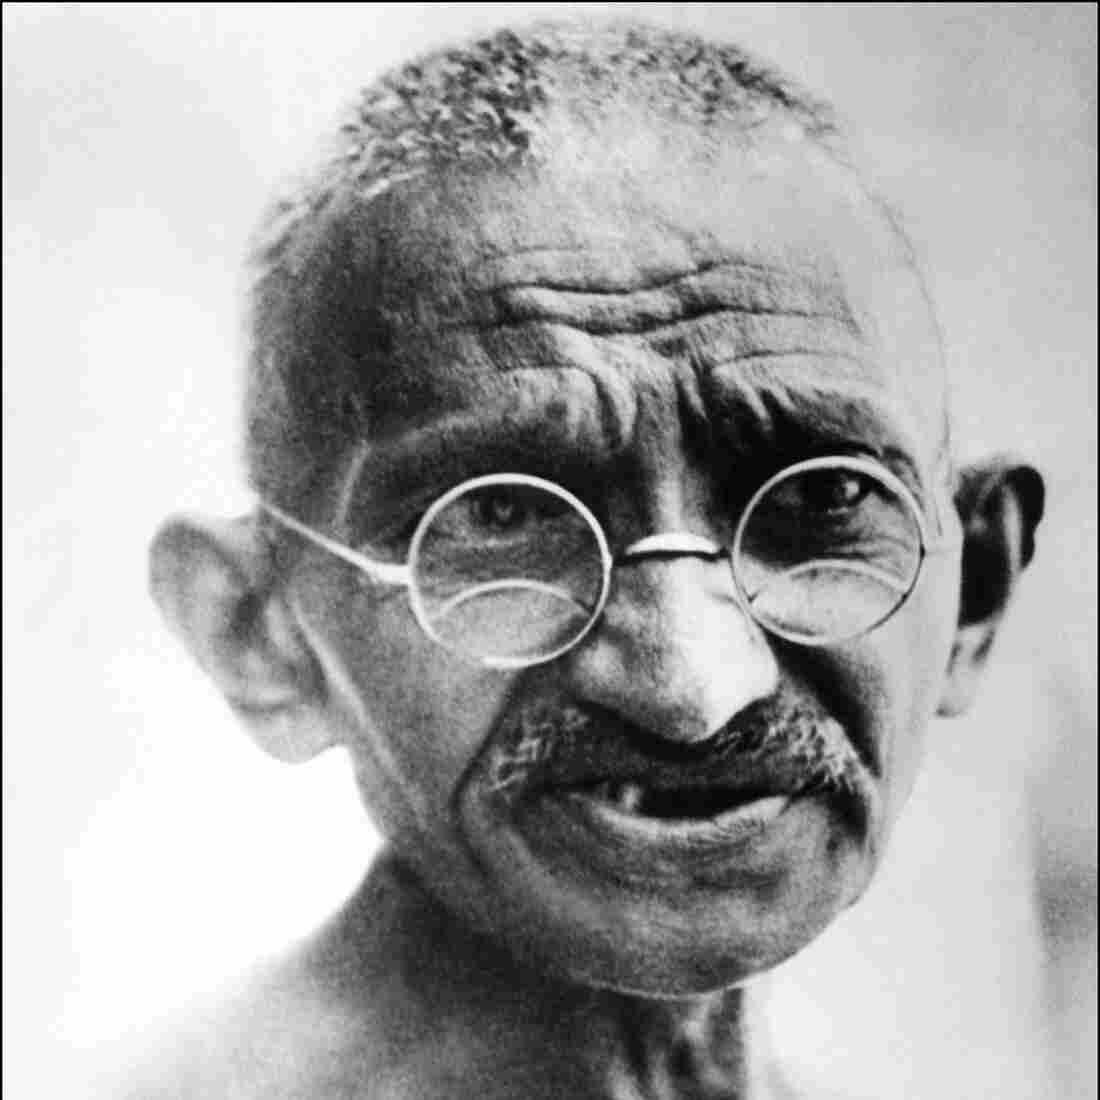 A picture of Gandhi taken on  July 24, 1931 in New Delhi.